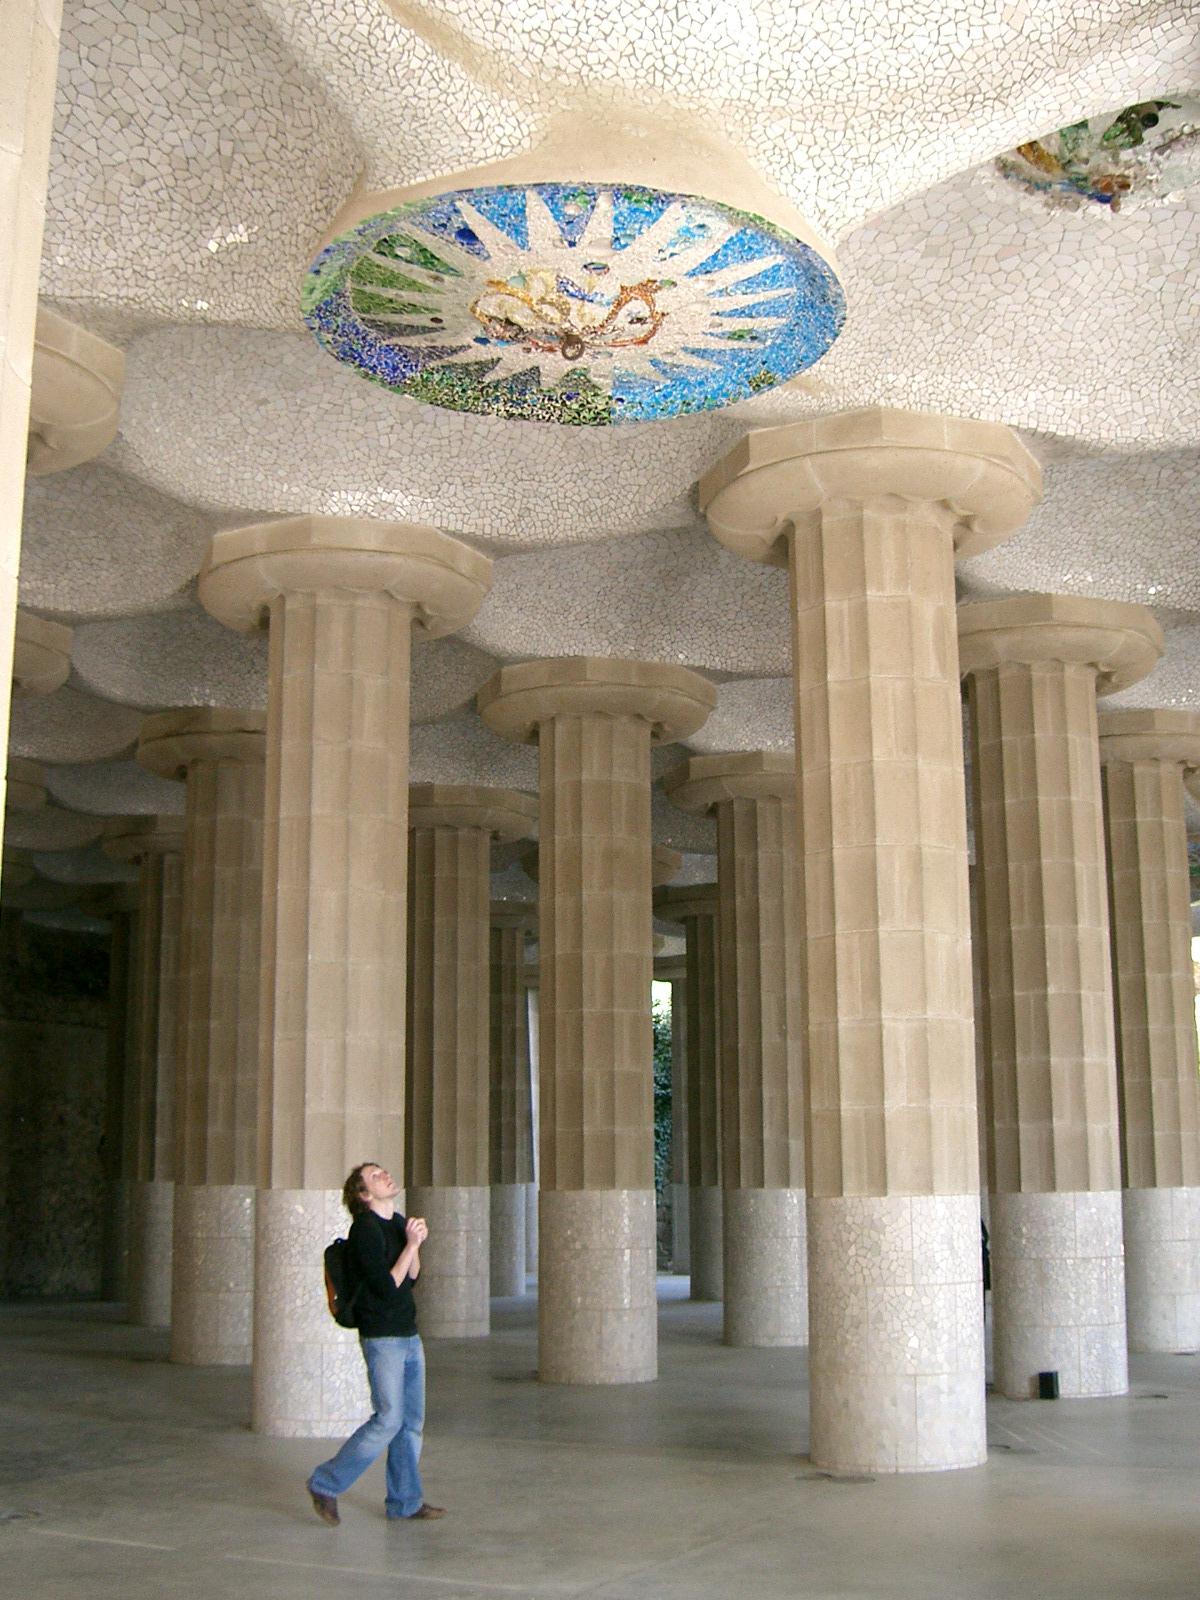 Foto de la Sala de las Cien Columnas